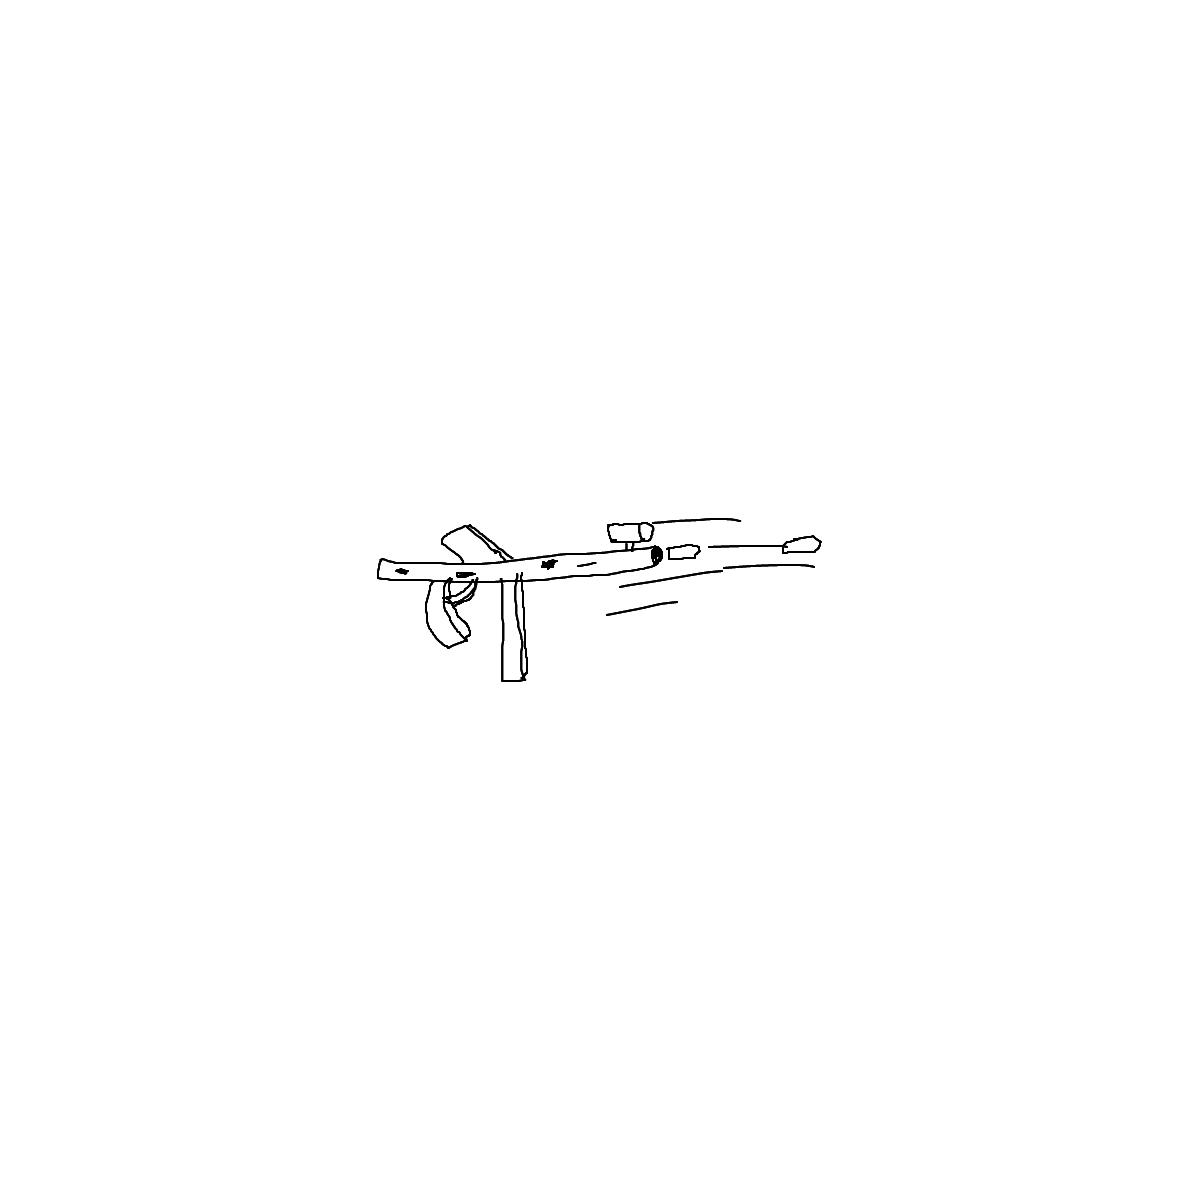 BAAAM drawing#23581 lat:36.1662826538085940lng: -115.1492309570312500